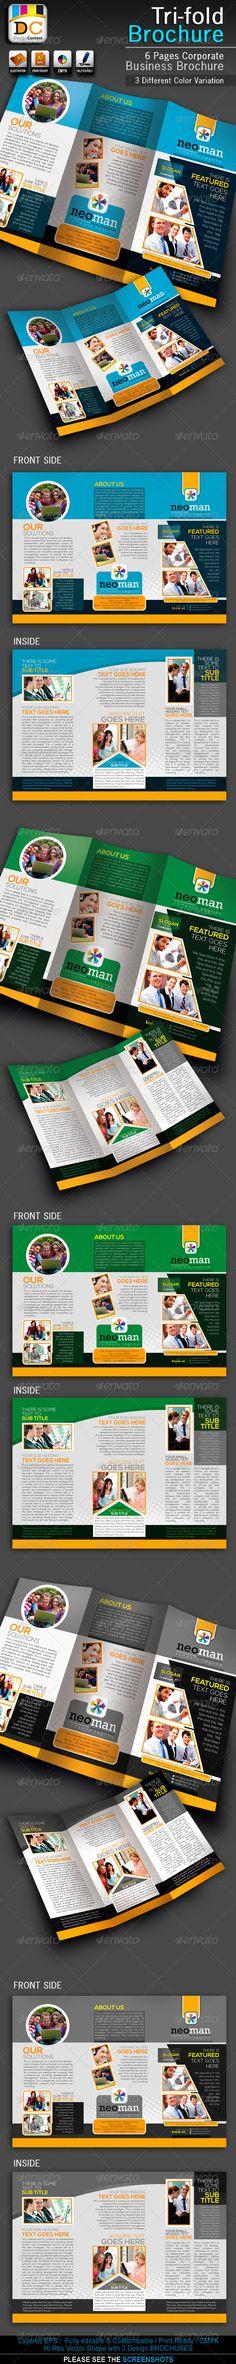 NeoMan Tri-fold Corporate Business Brochure